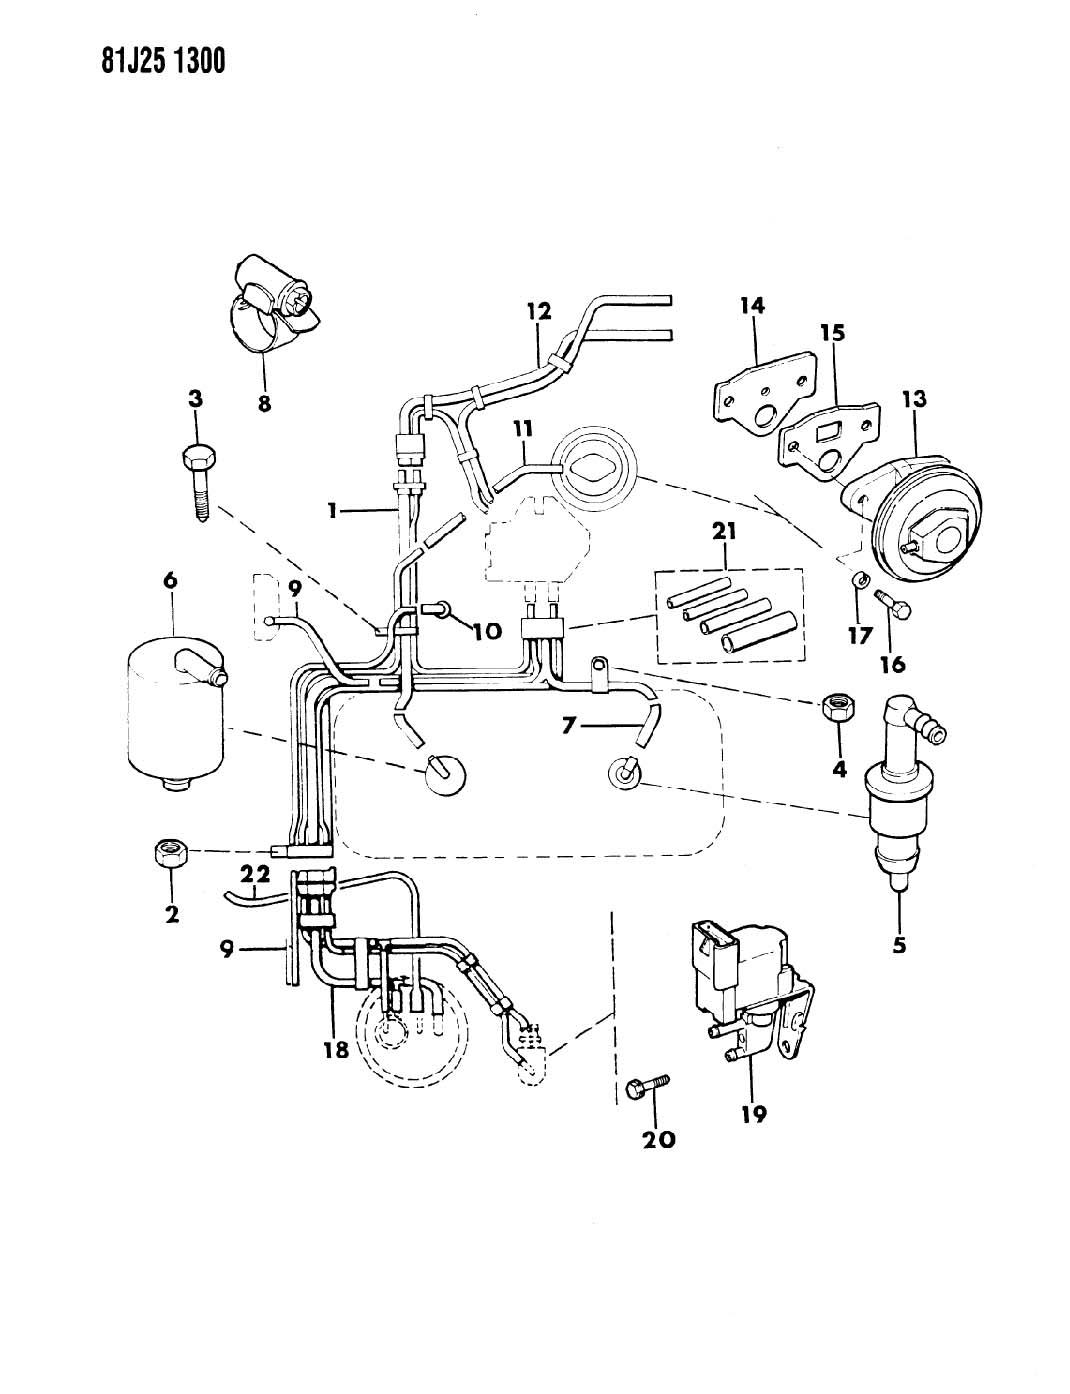 86 jeep anche fuel filter 1986 jeep cj7 wiring diagram at ww w